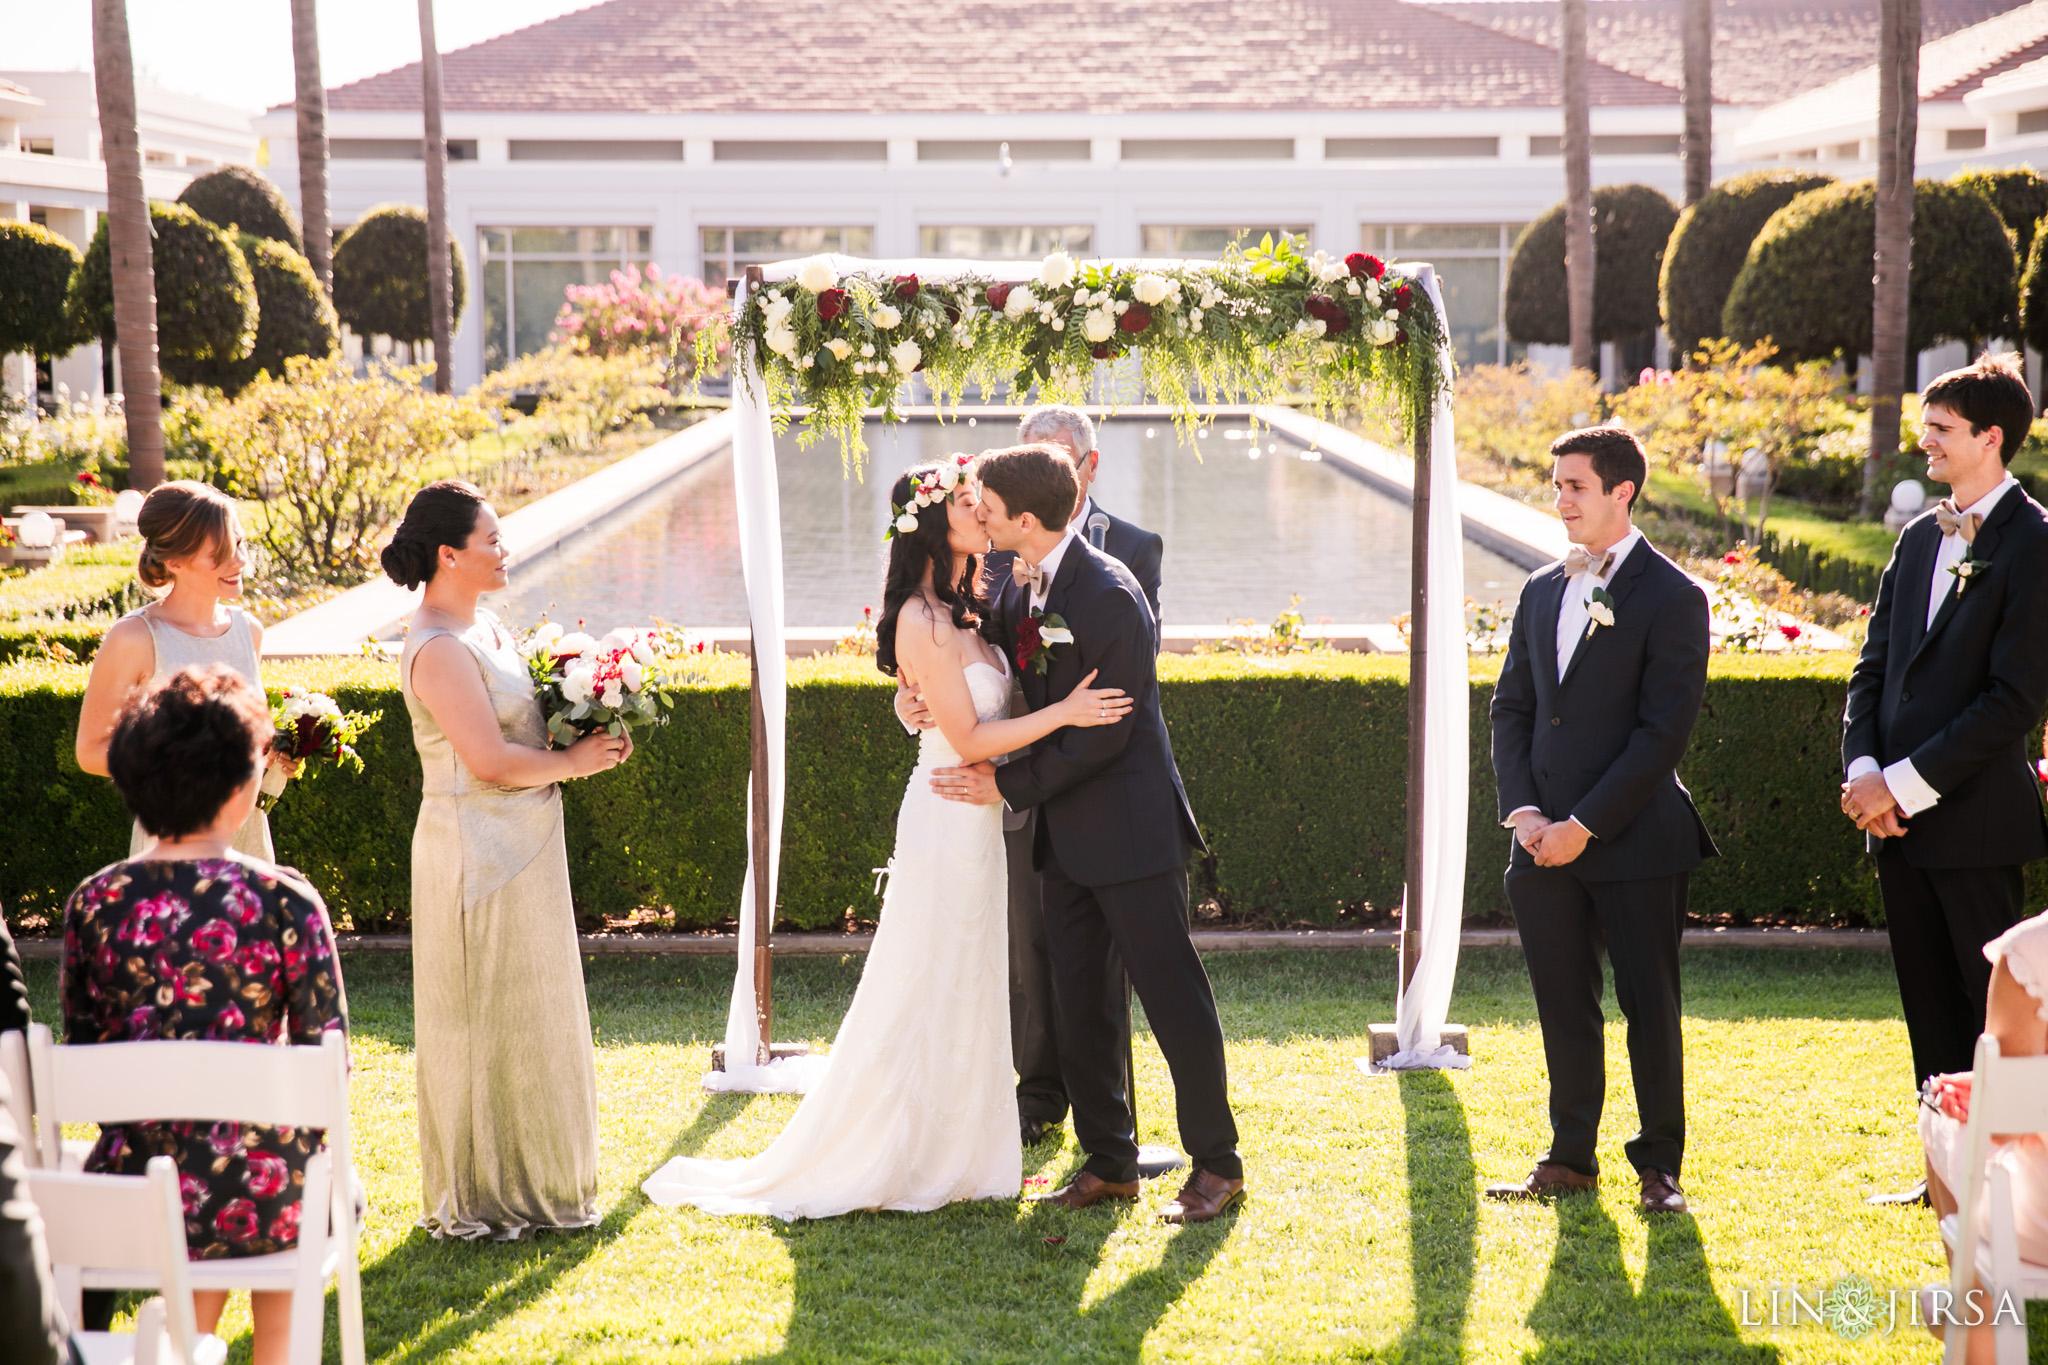 022 richard nixon library wedding ceremony photography 1